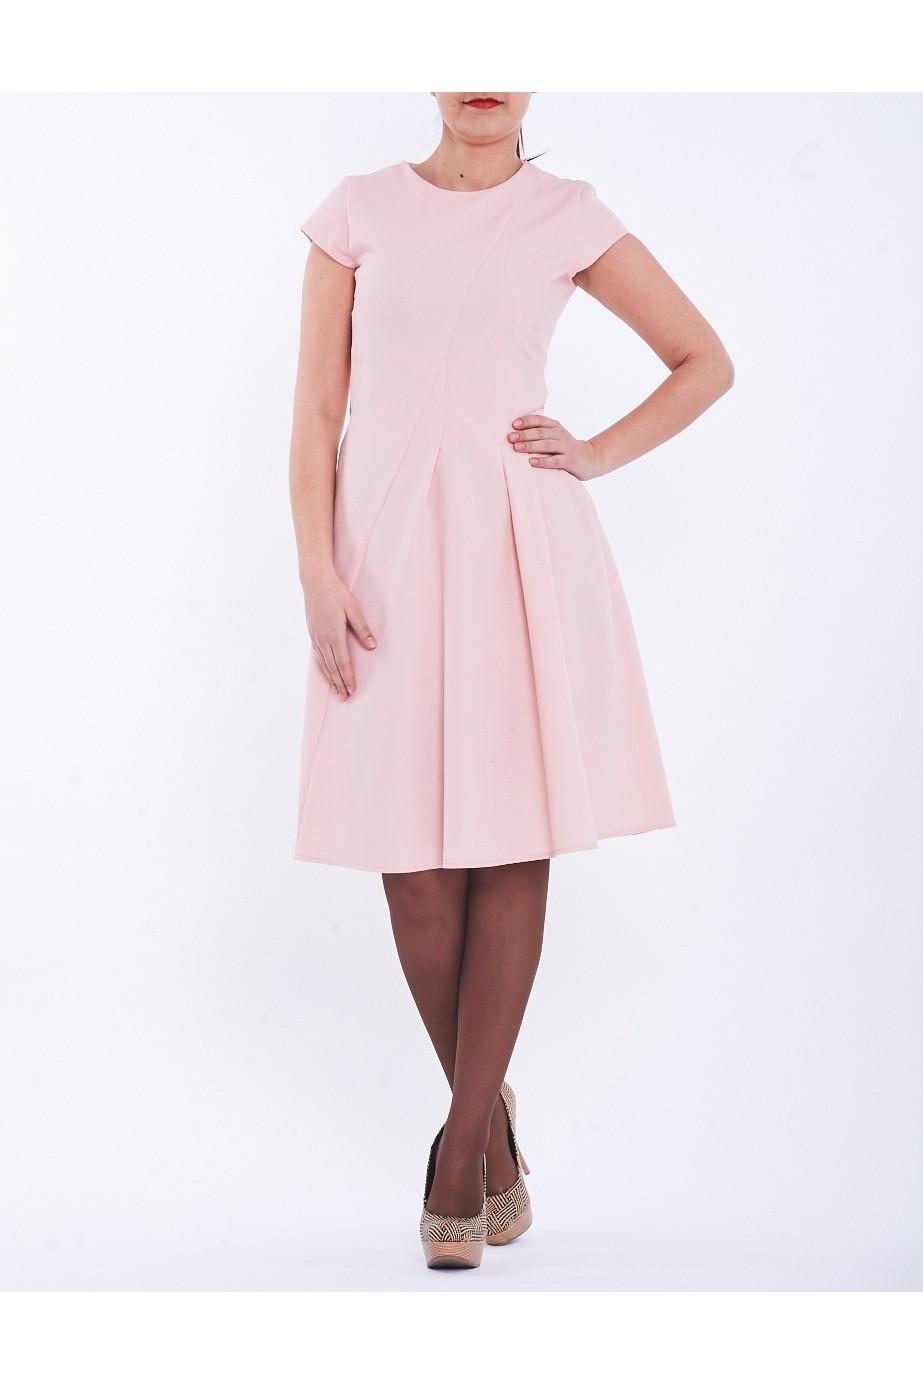 Rochie roz pal cu pliuri pe partea stanga TinaR 36